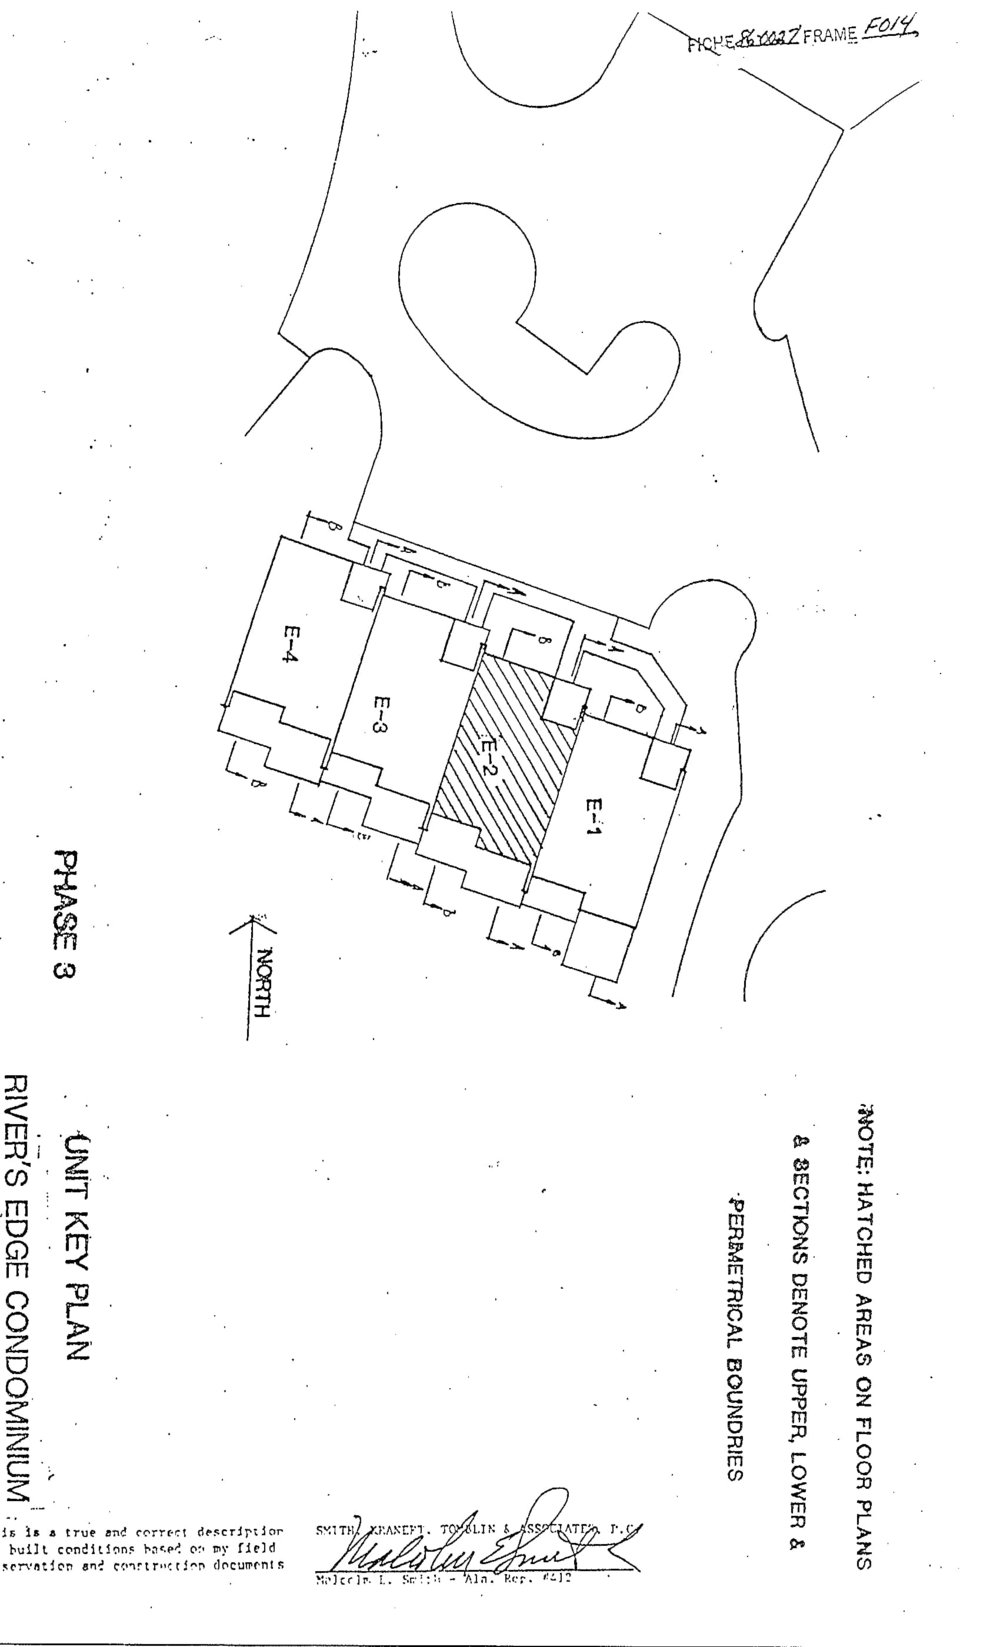 Covenants-Rivers-Edge-Condominiums-All-Phases-150.jpg